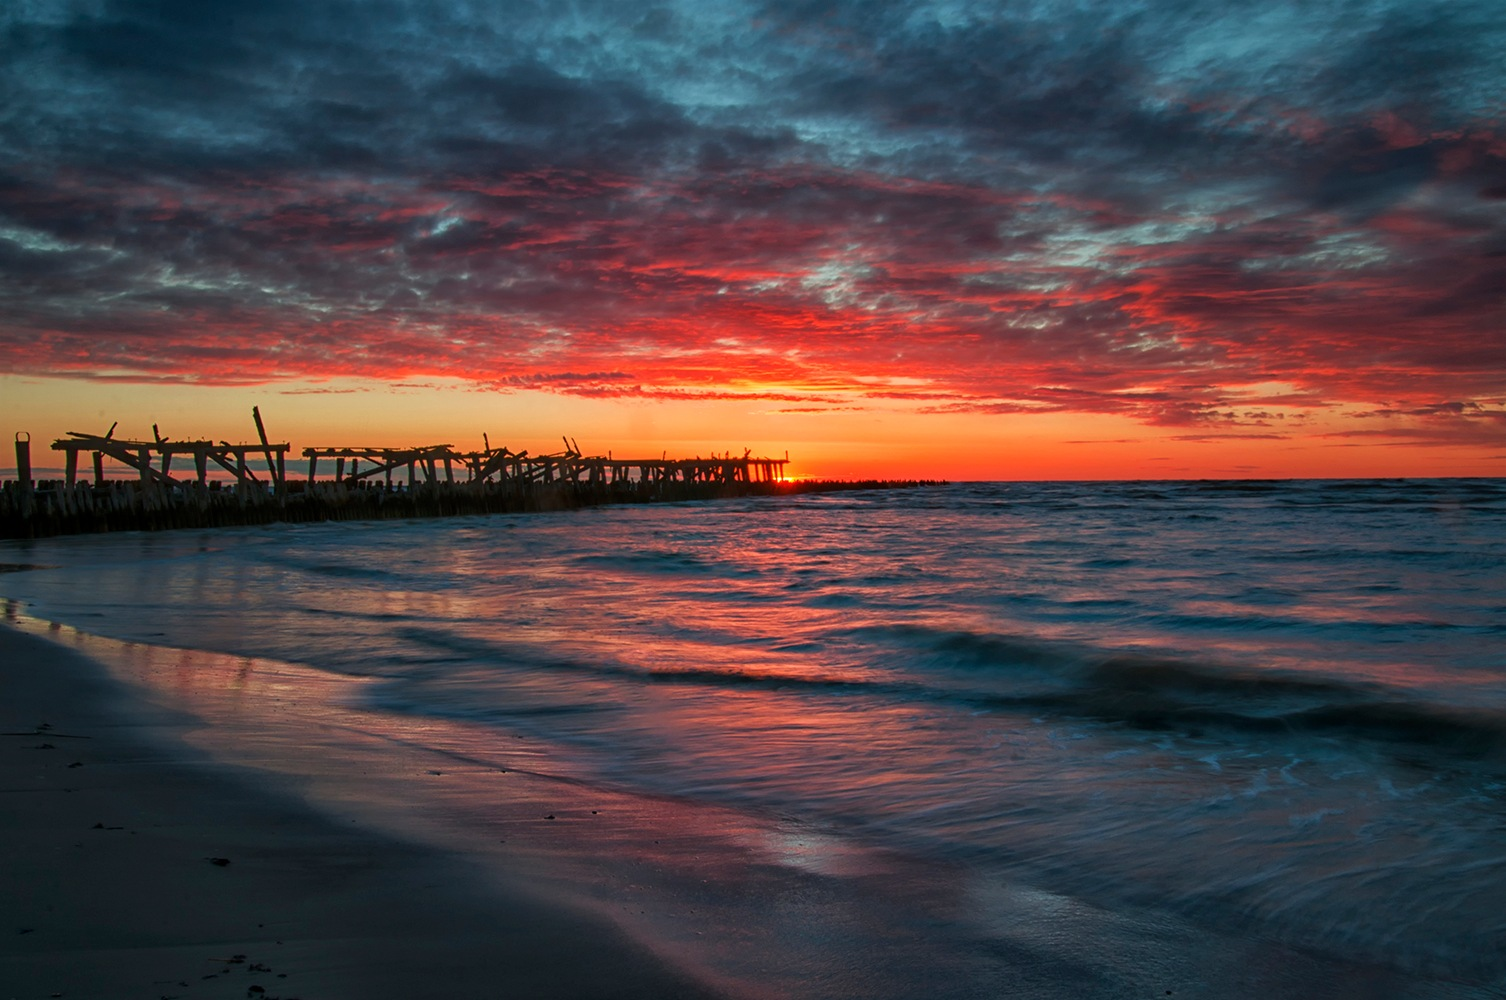 Sunset by azelevas